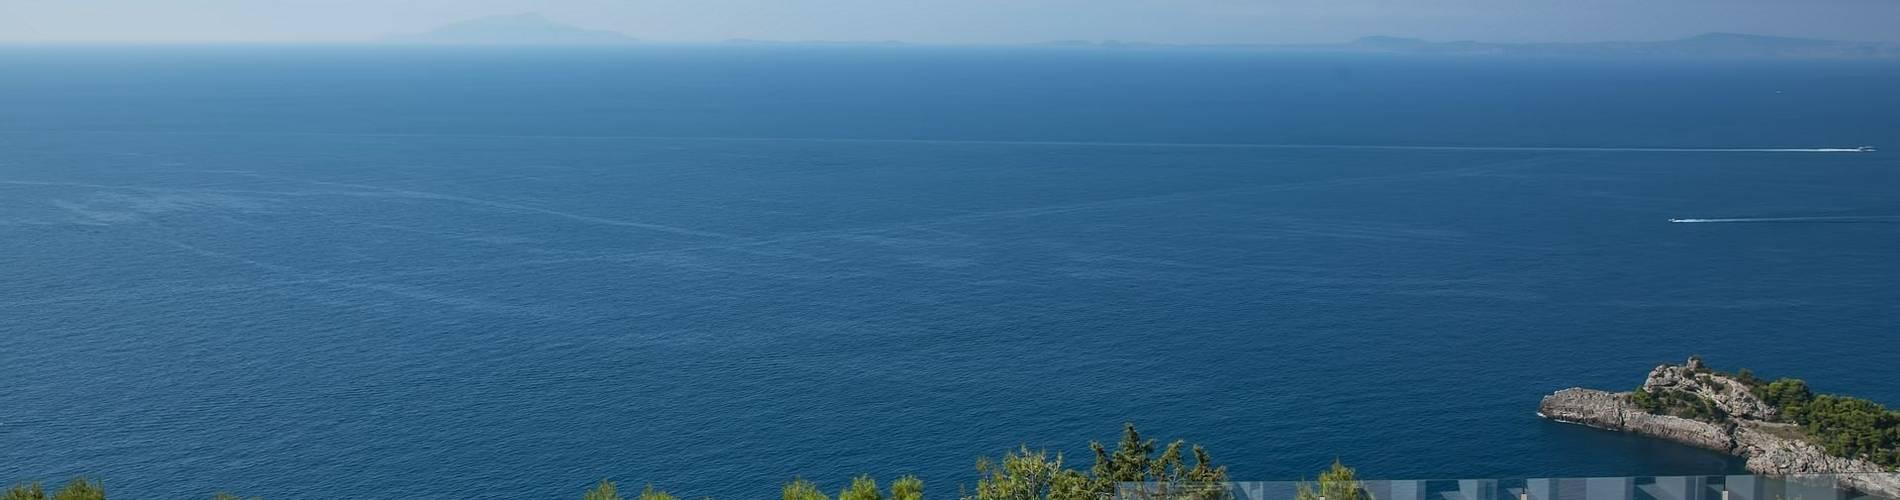 Relais Blu, Sorrento, Italy (14).jpg